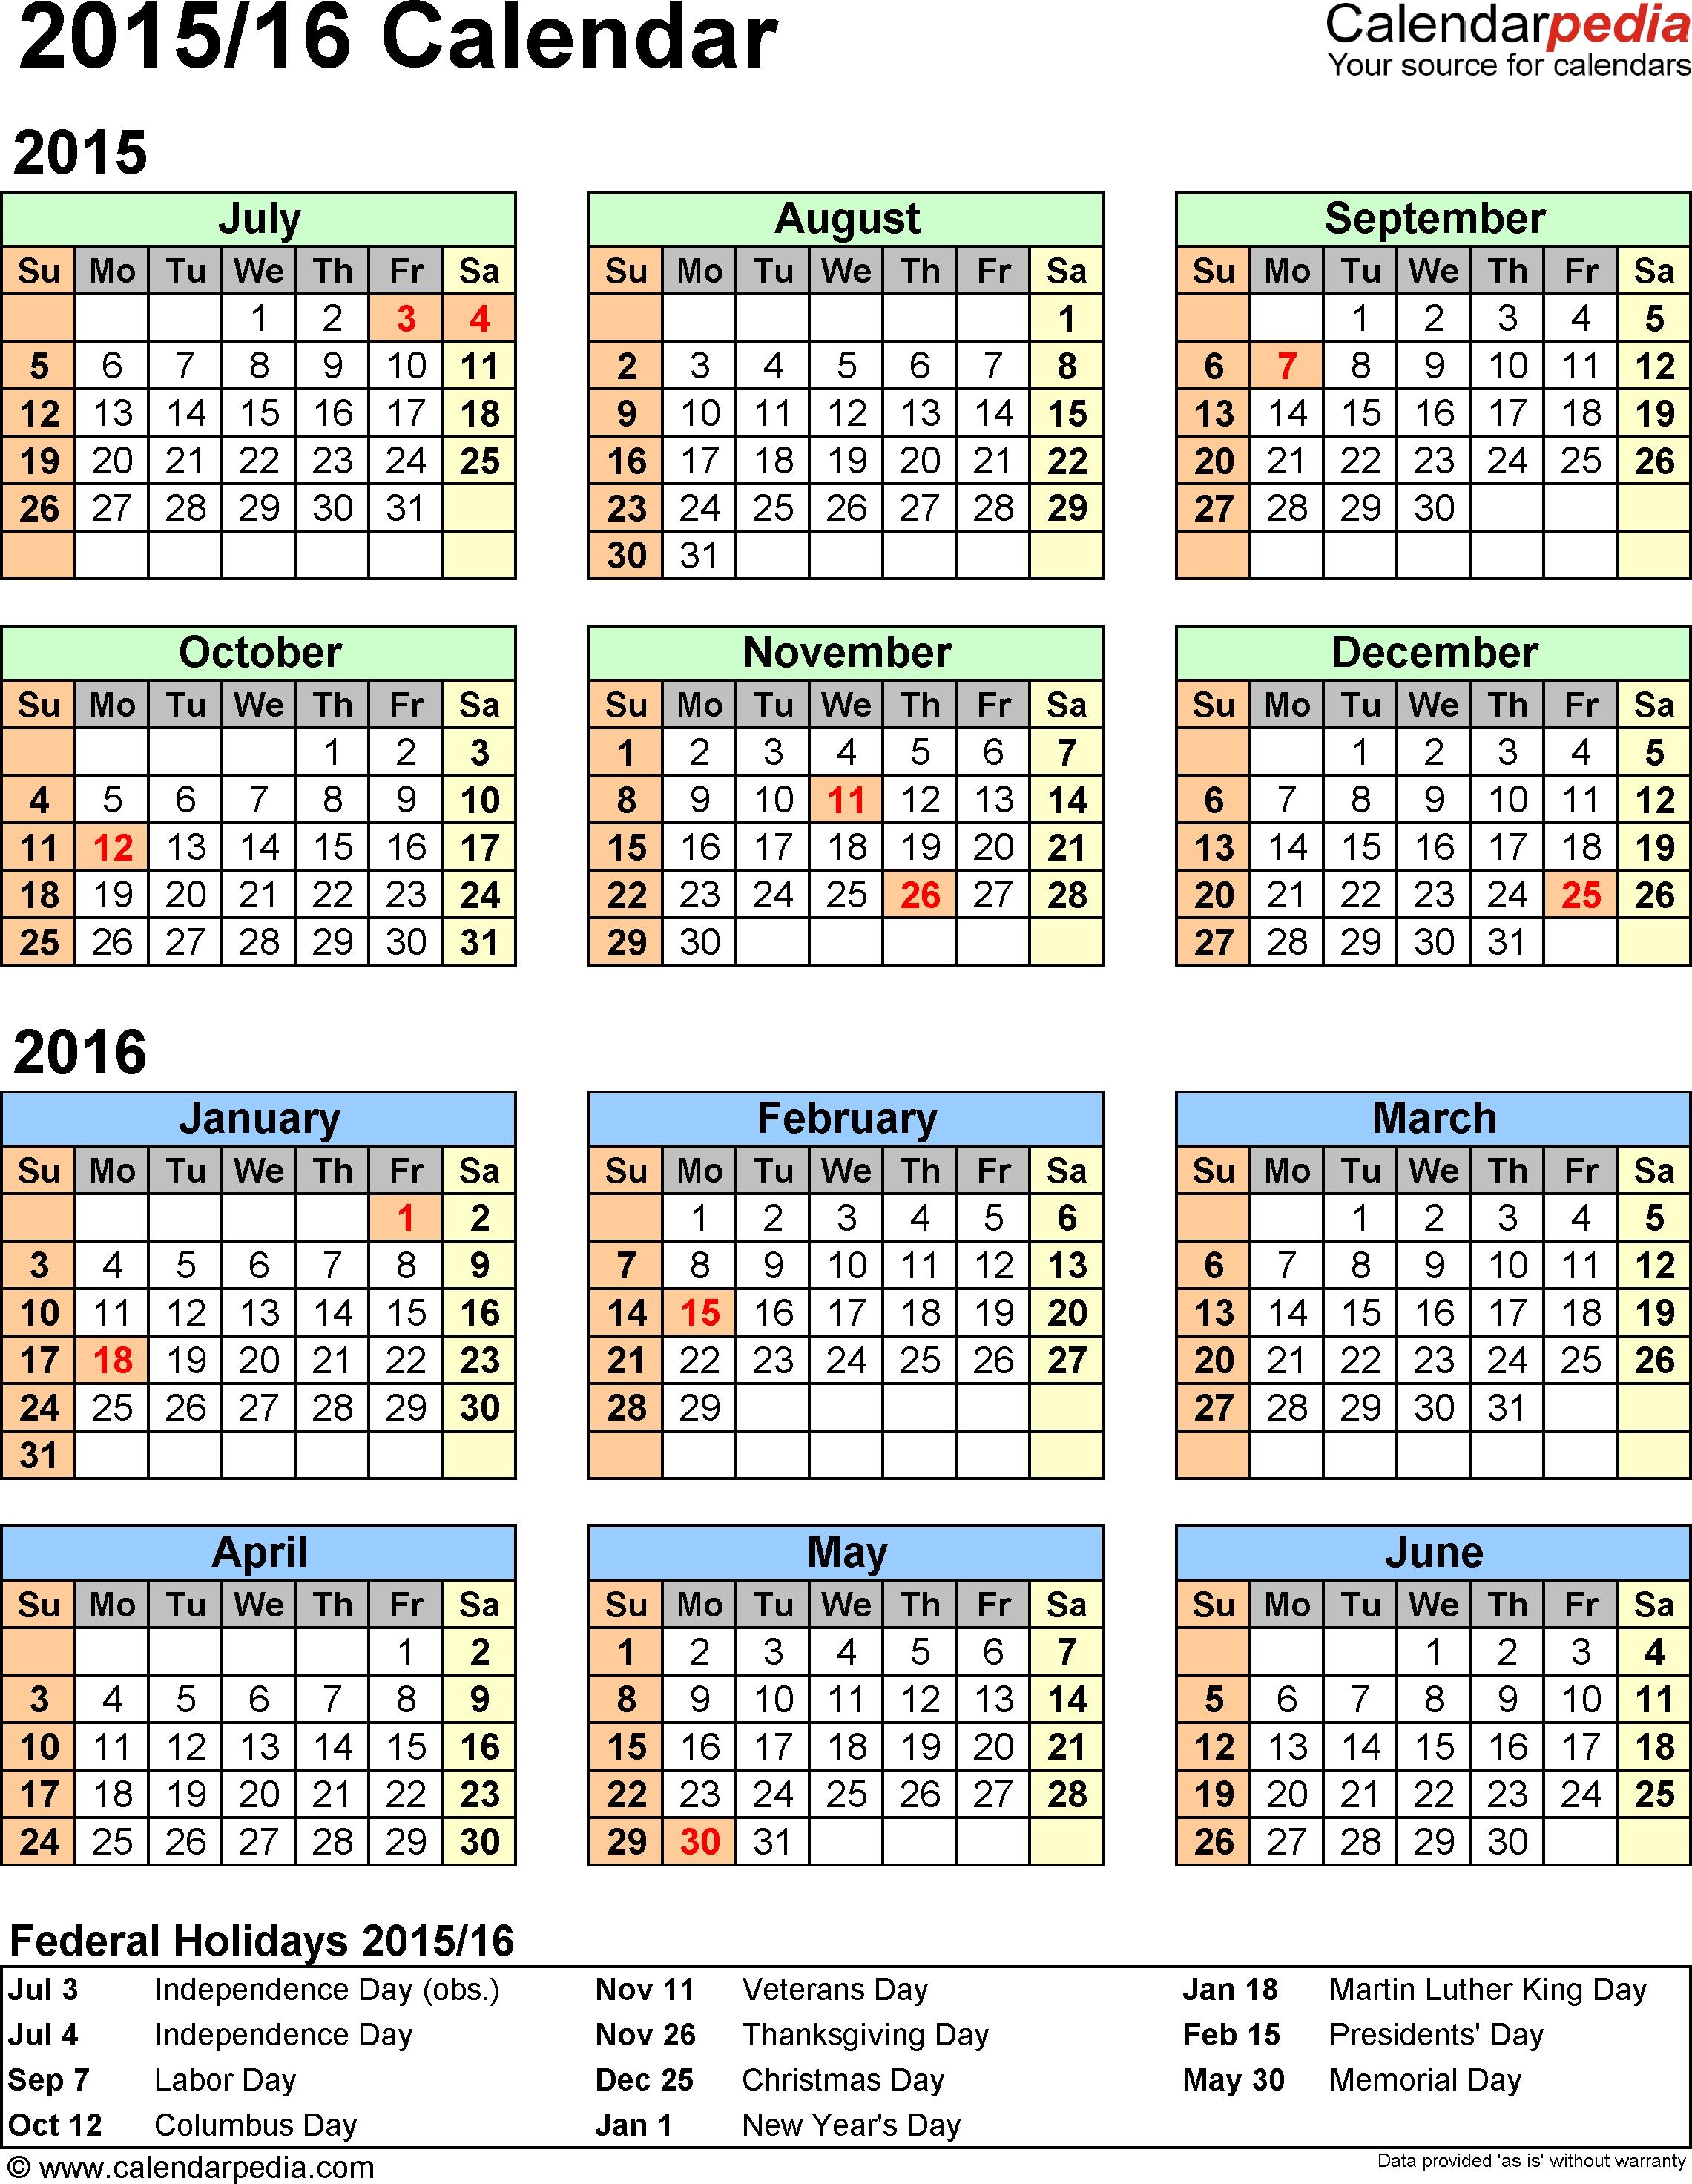 Split Year Calendar 2015/16 (July To June) - Pdf Templates  Financial Year Australia Callendar